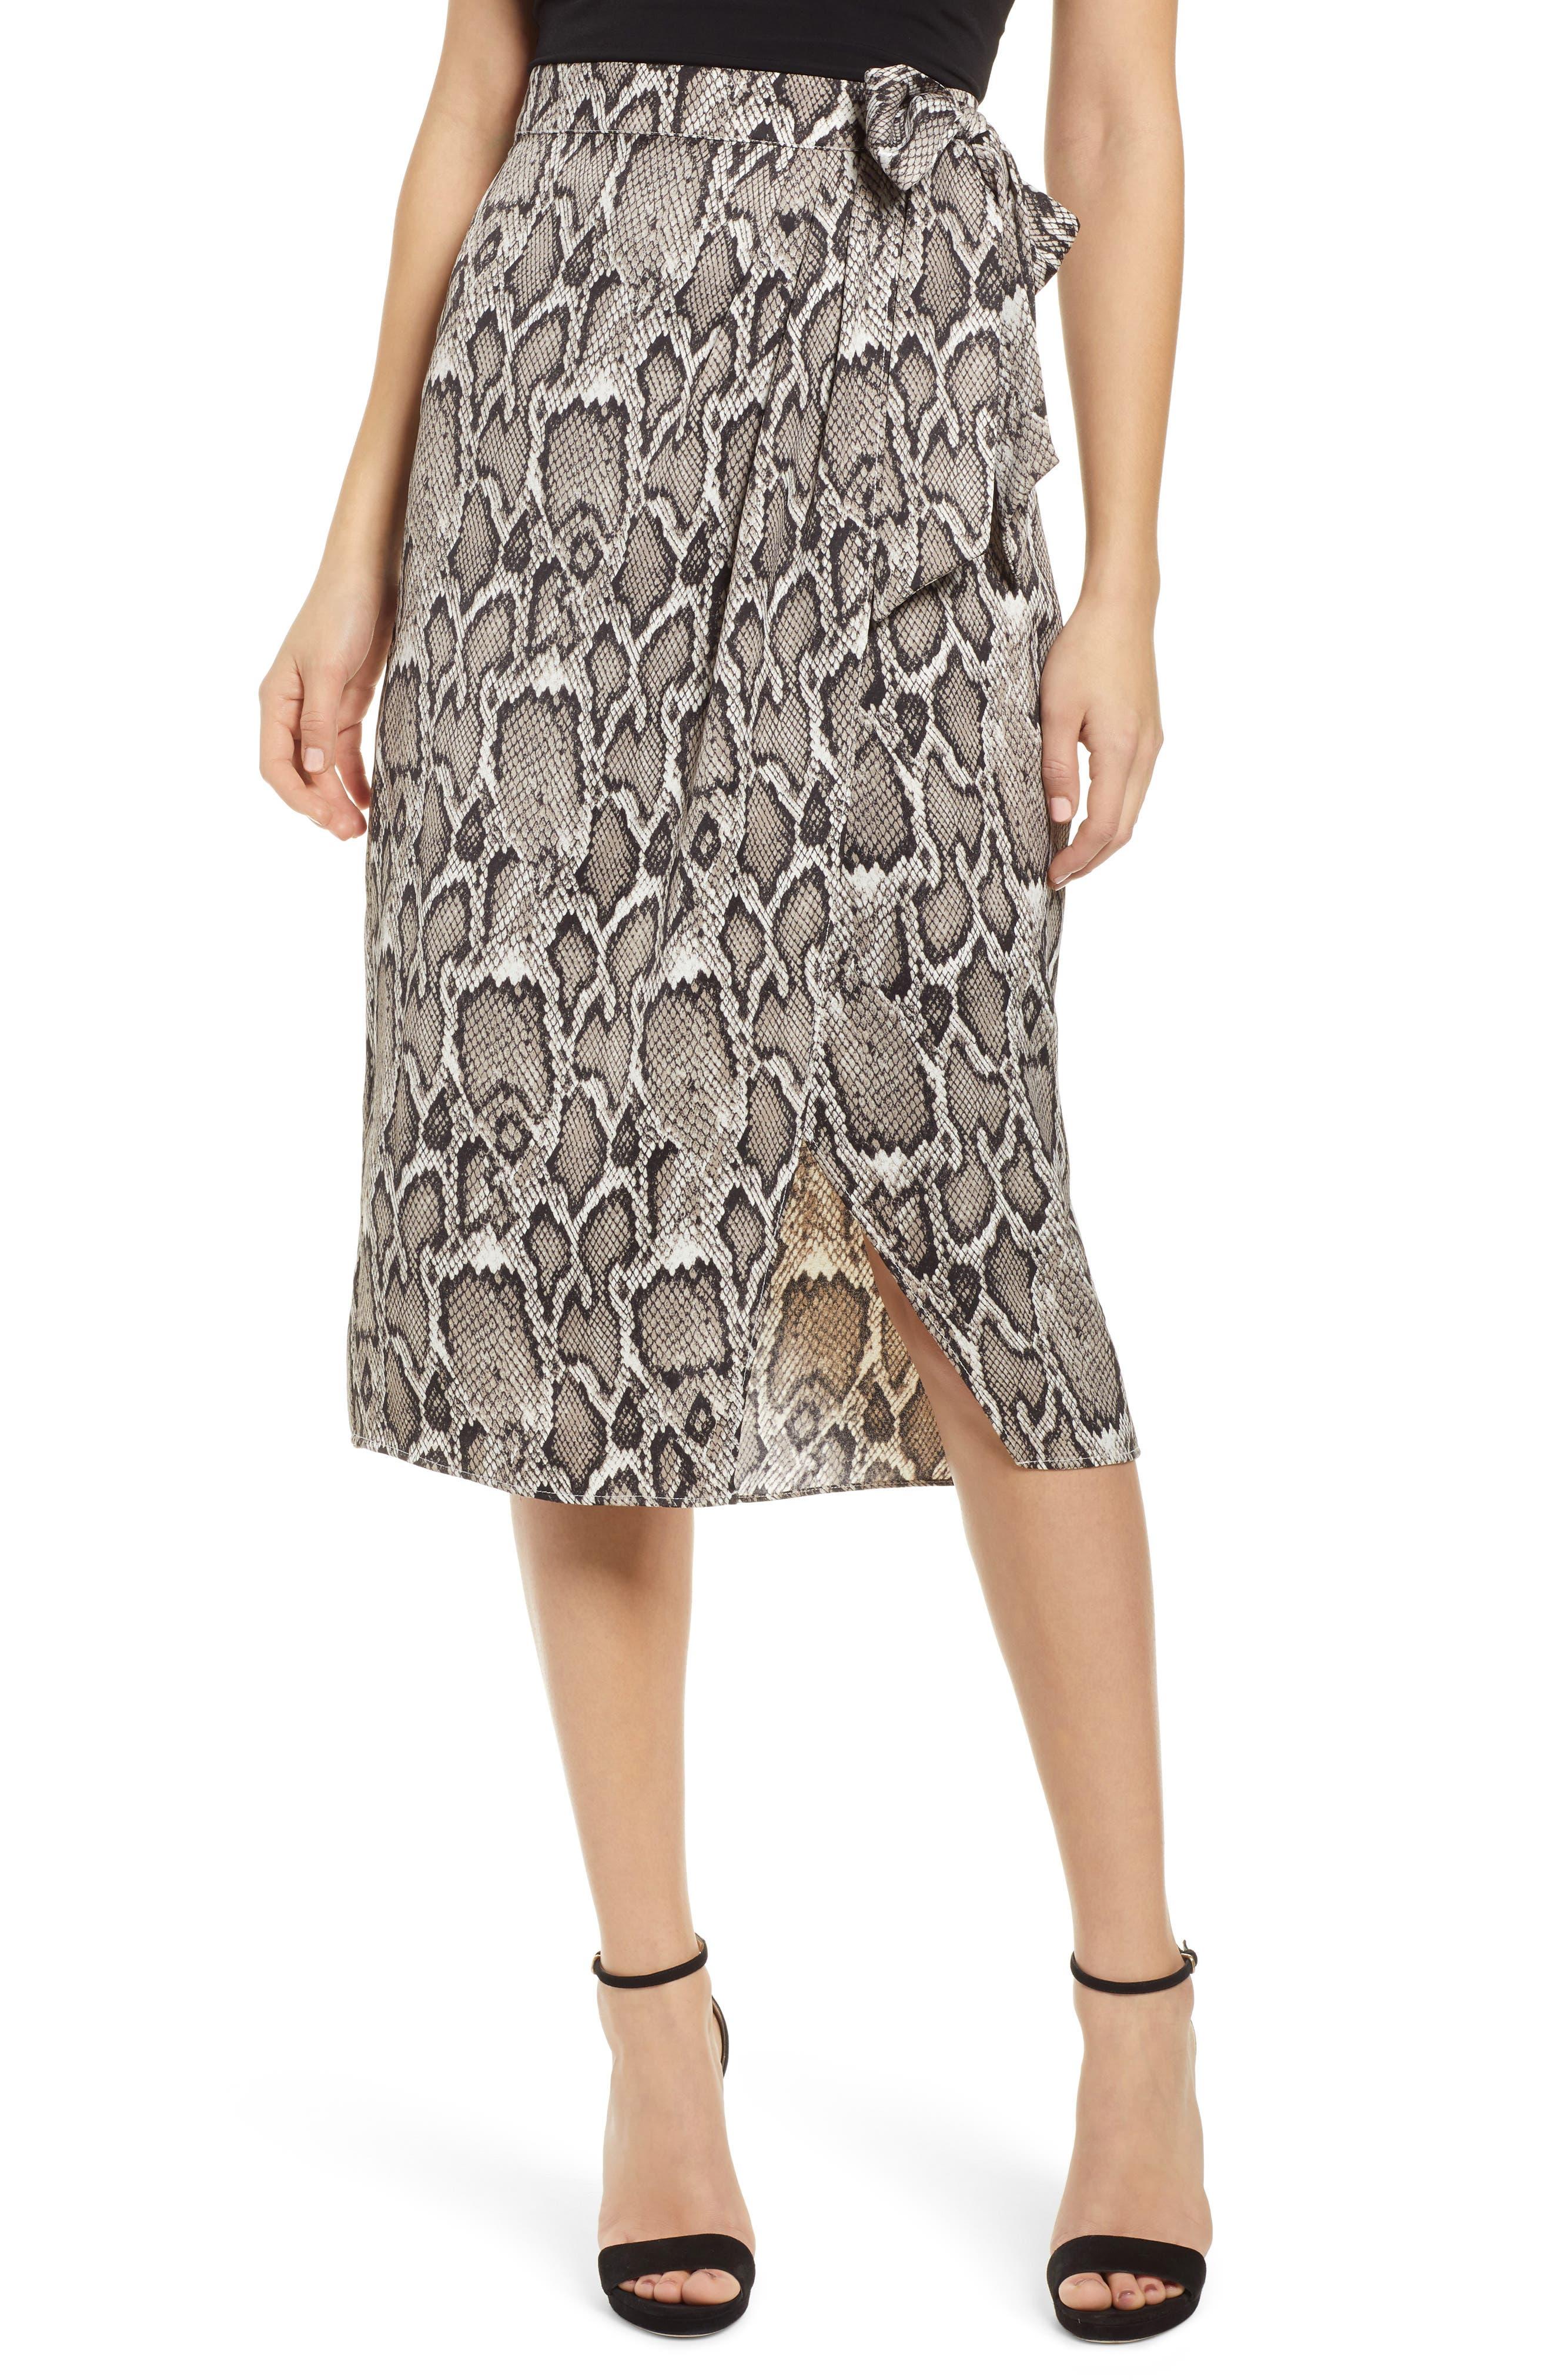 Afrm Savvy Snakeskin Print Wrap Skirt, Beige